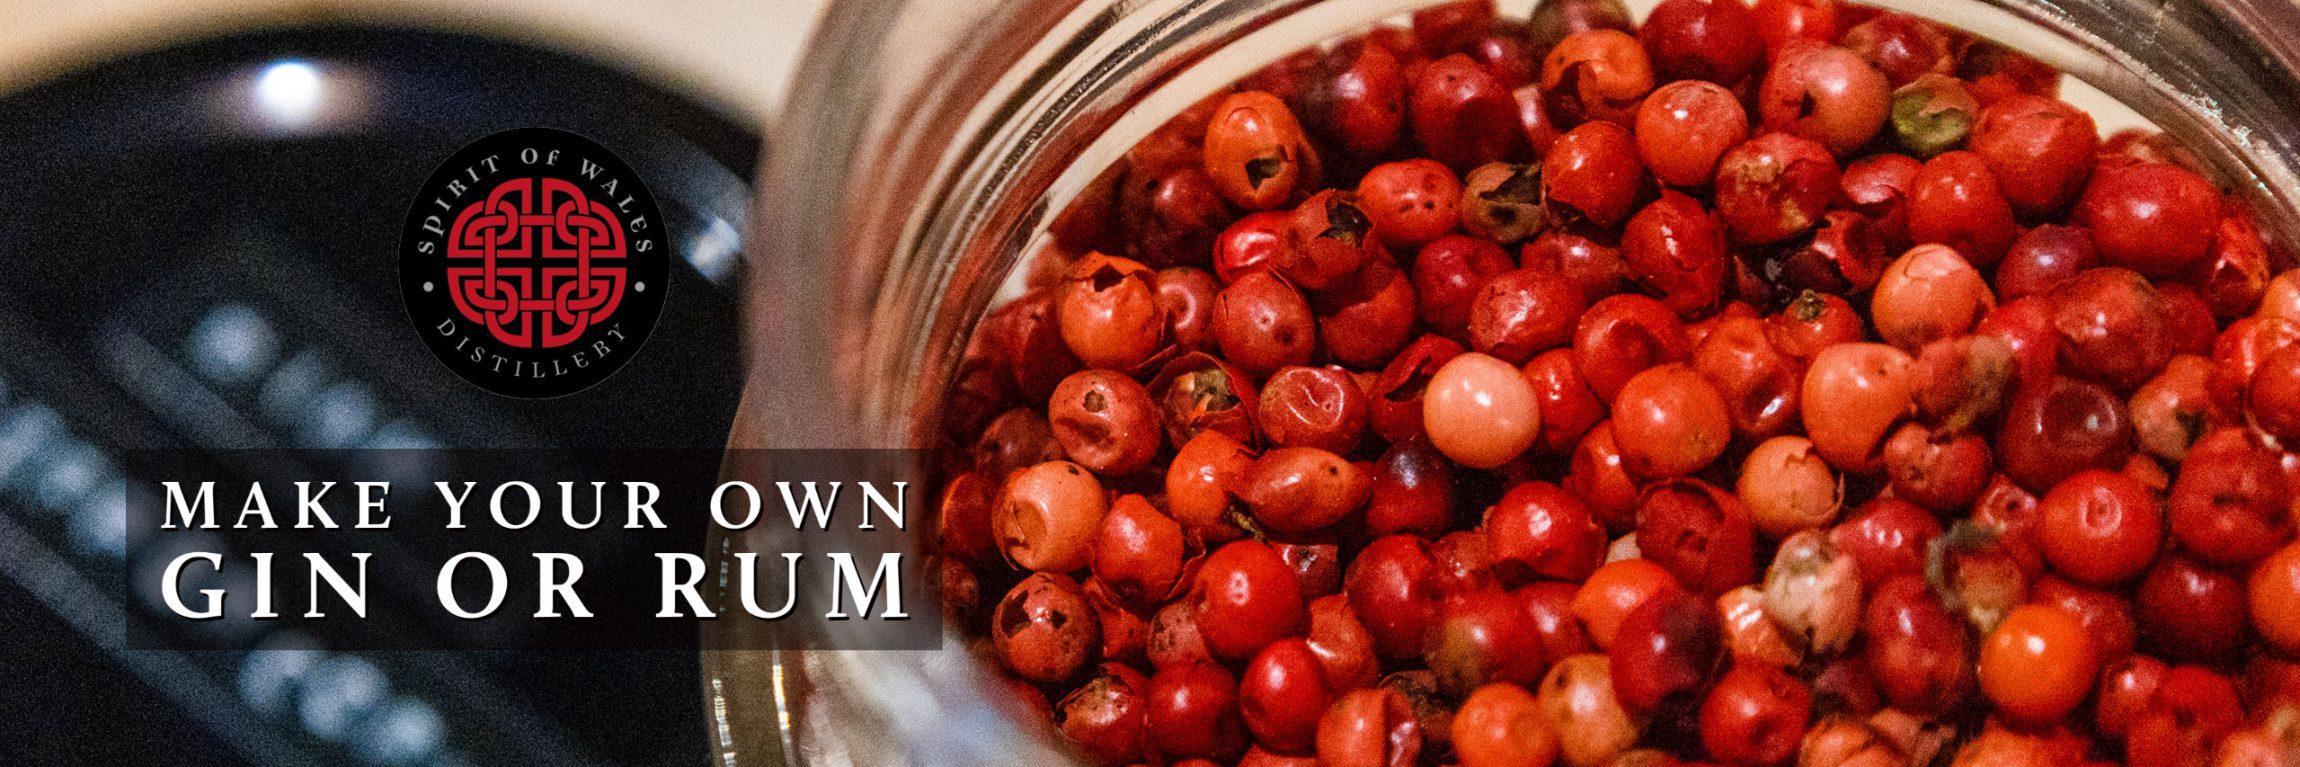 Spirit of Wales Distillery - Make your own gin or rum Botanicals jar